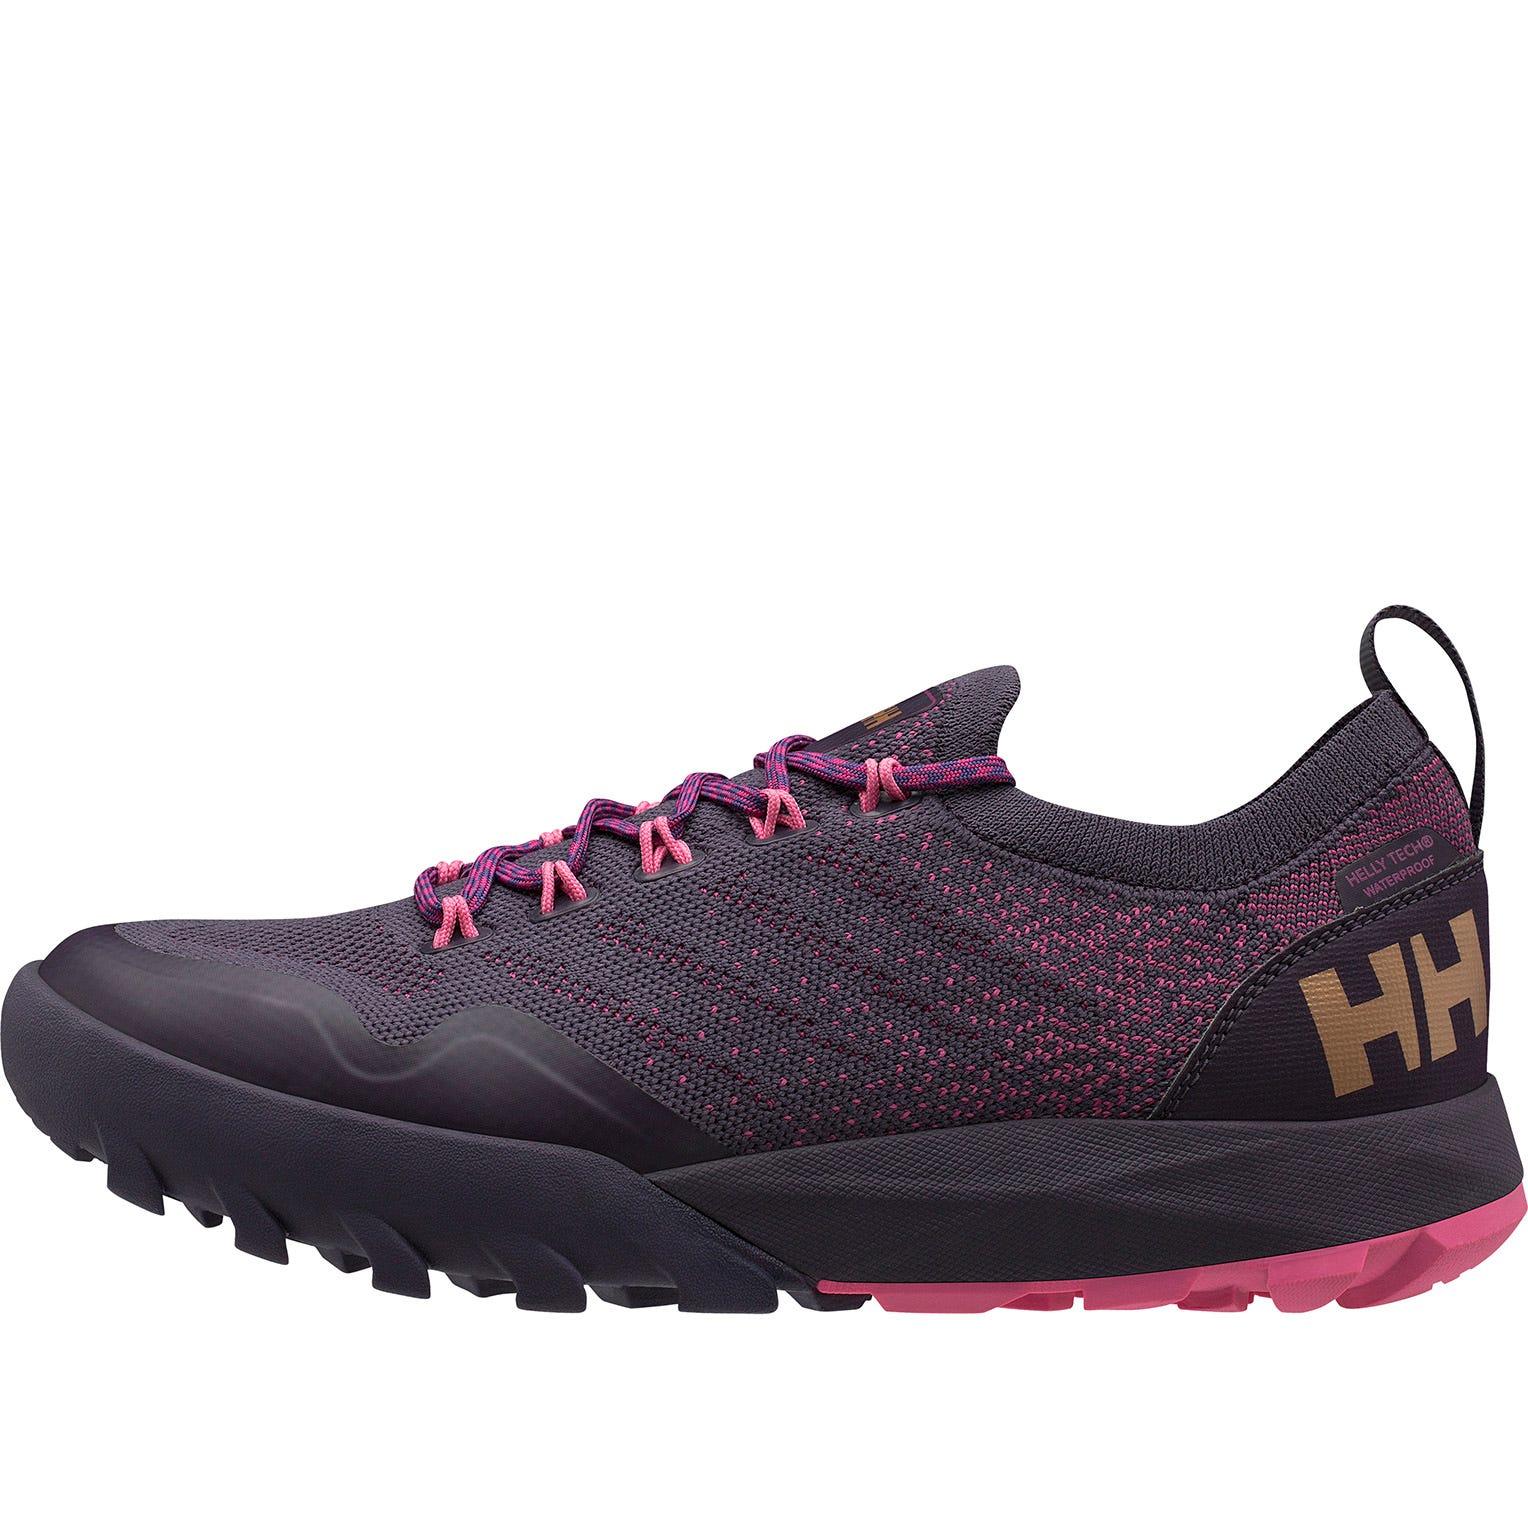 Helly Hansen W Loke Dash 2 Ht Womens Hiking Boot Yellow 40.5/9